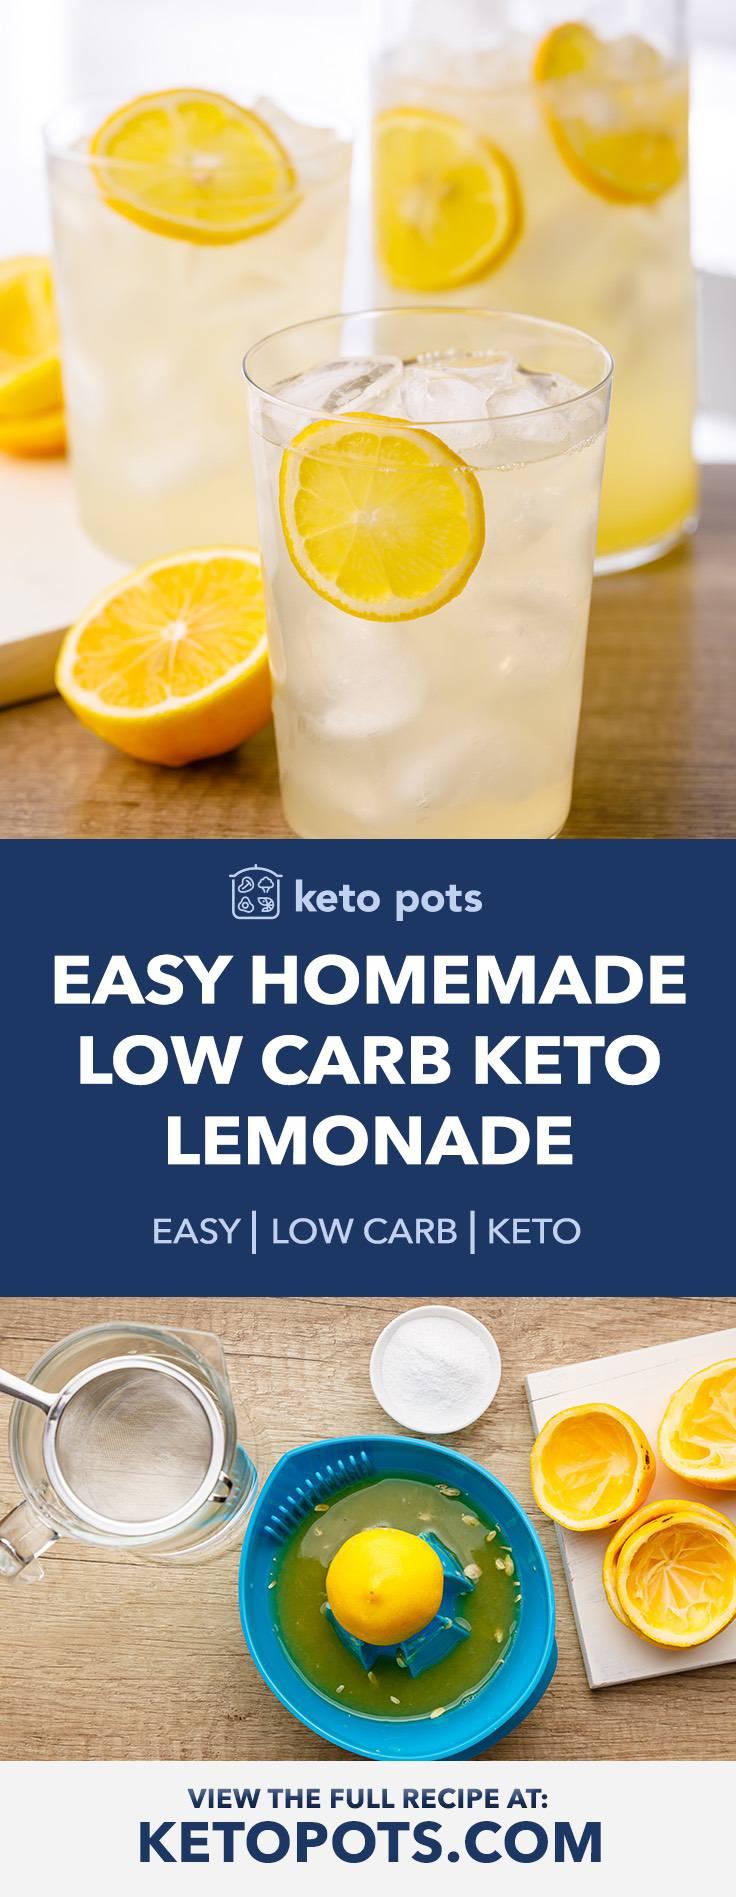 Easy Homemade Keto-friendly Lemonade